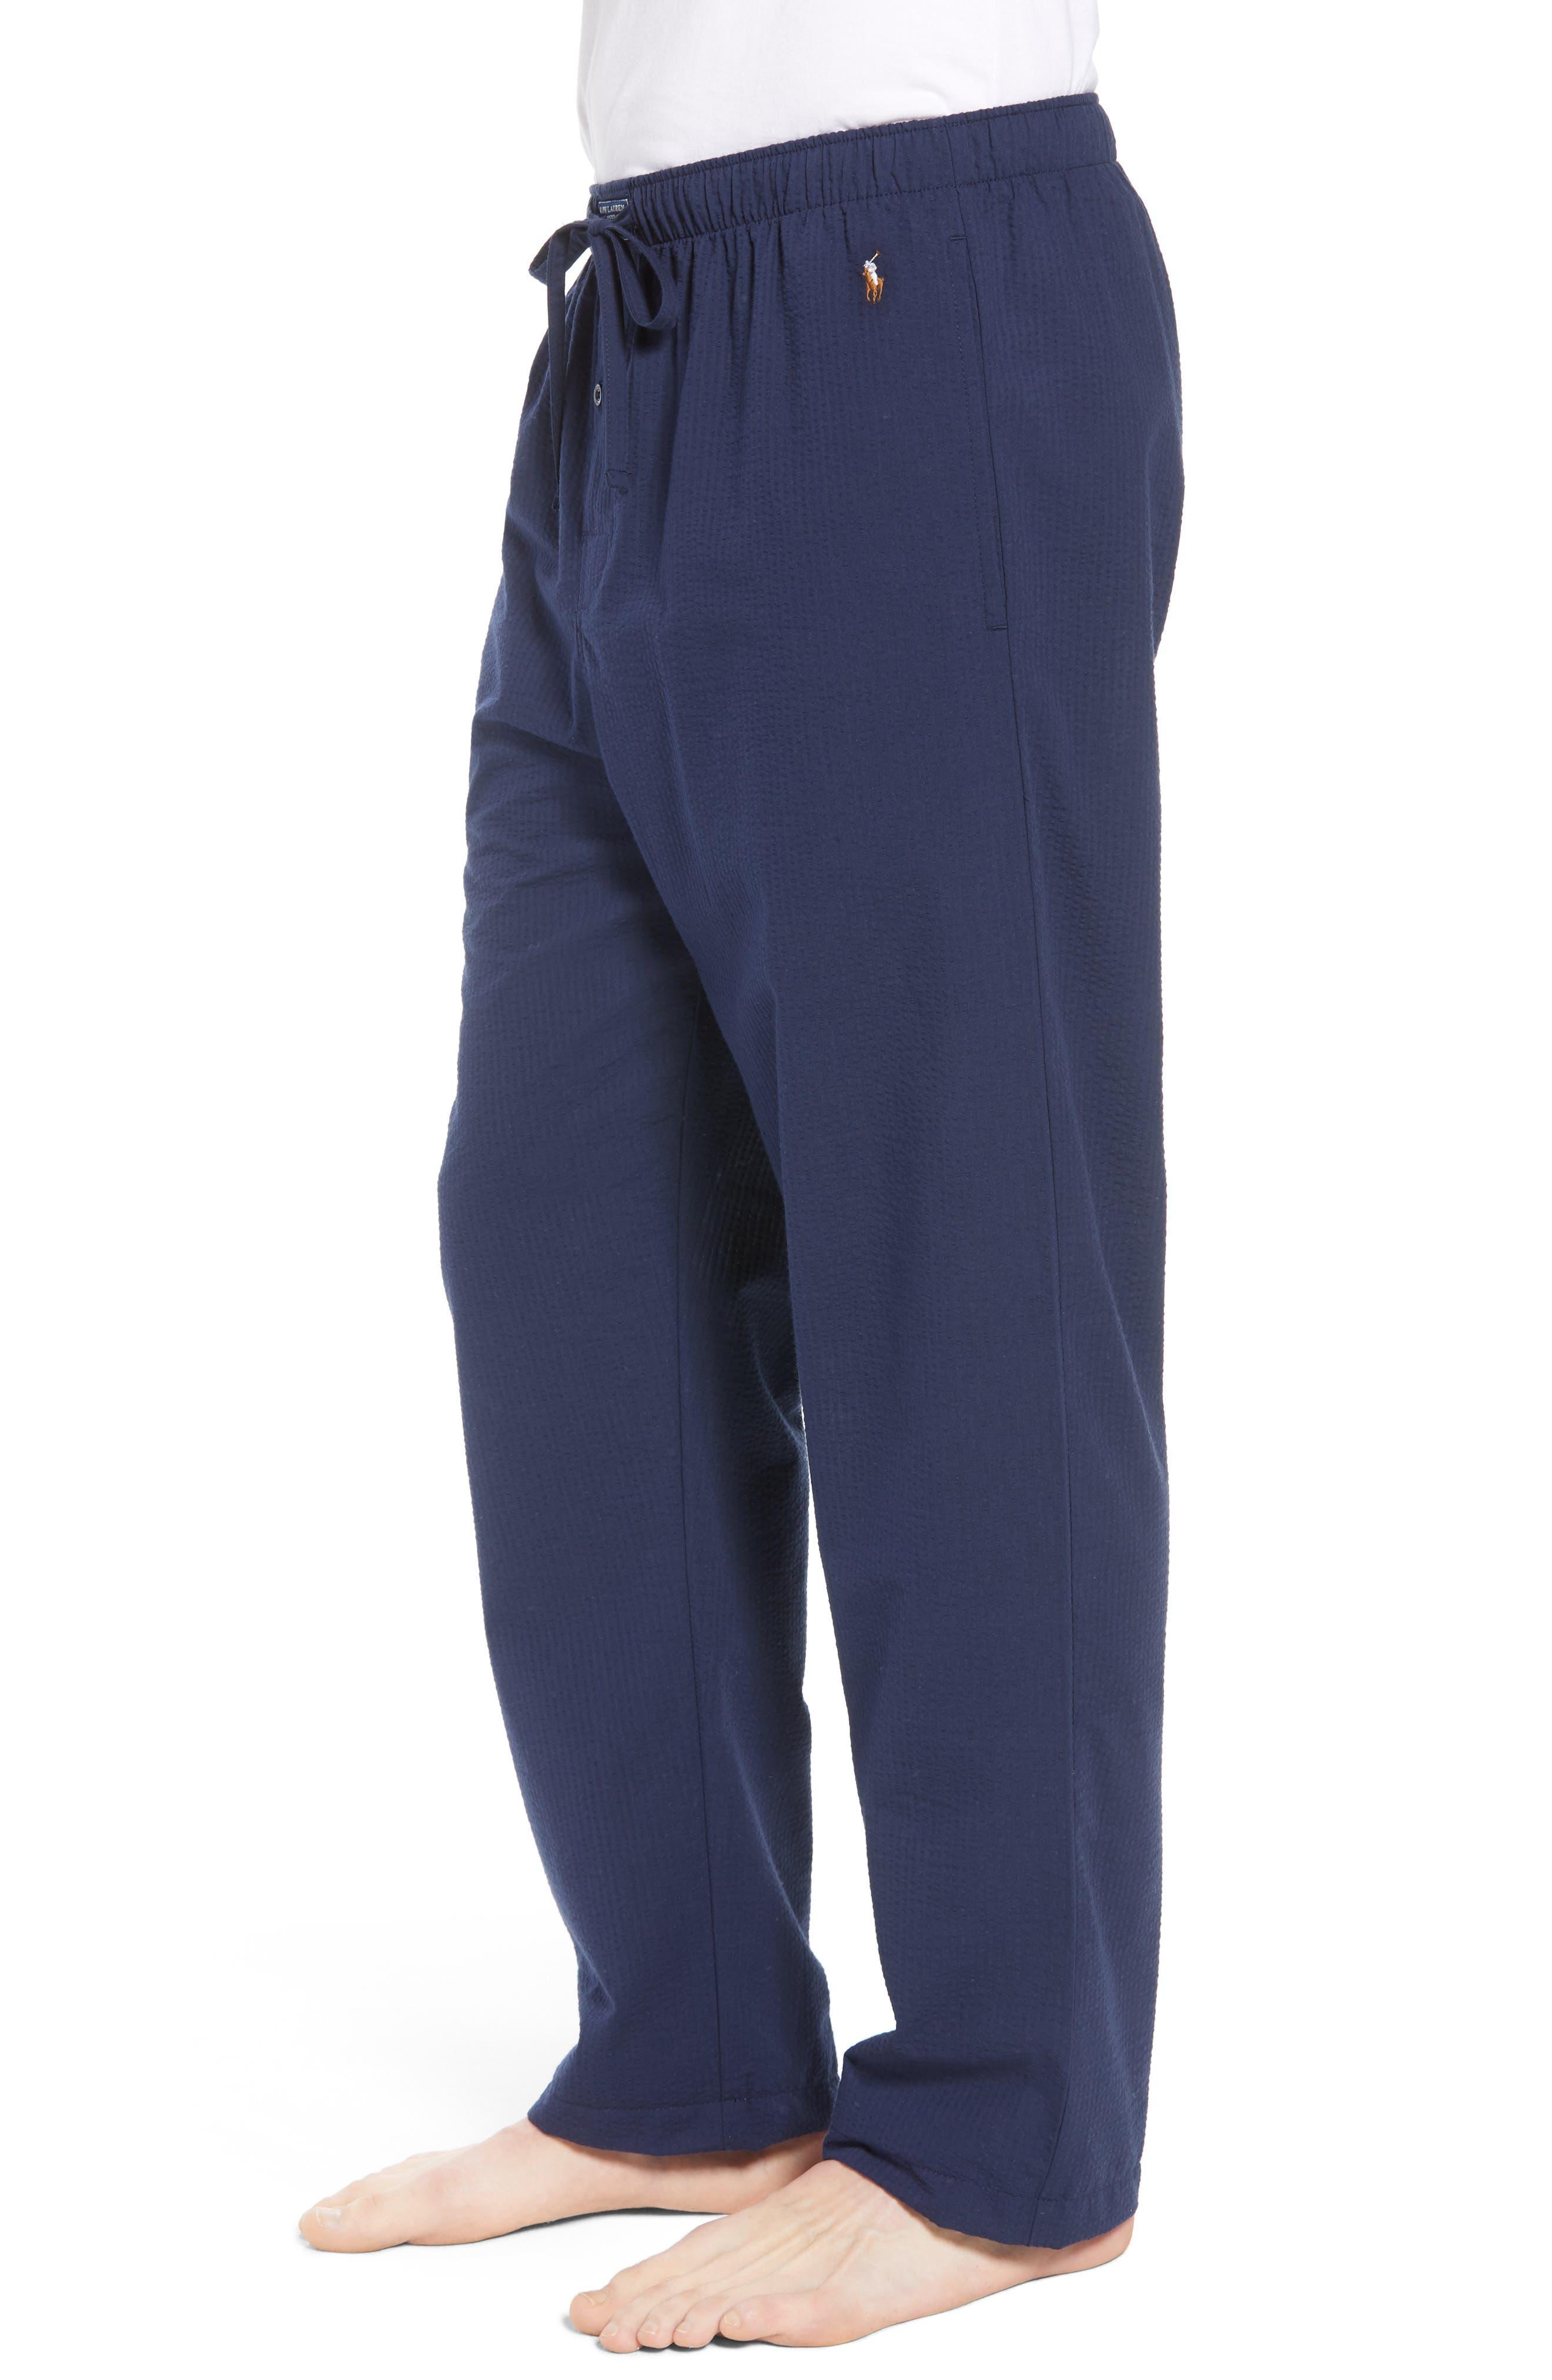 Seersucker Pajama Pants,                             Alternate thumbnail 3, color,                             NAVY SEERSUCKER